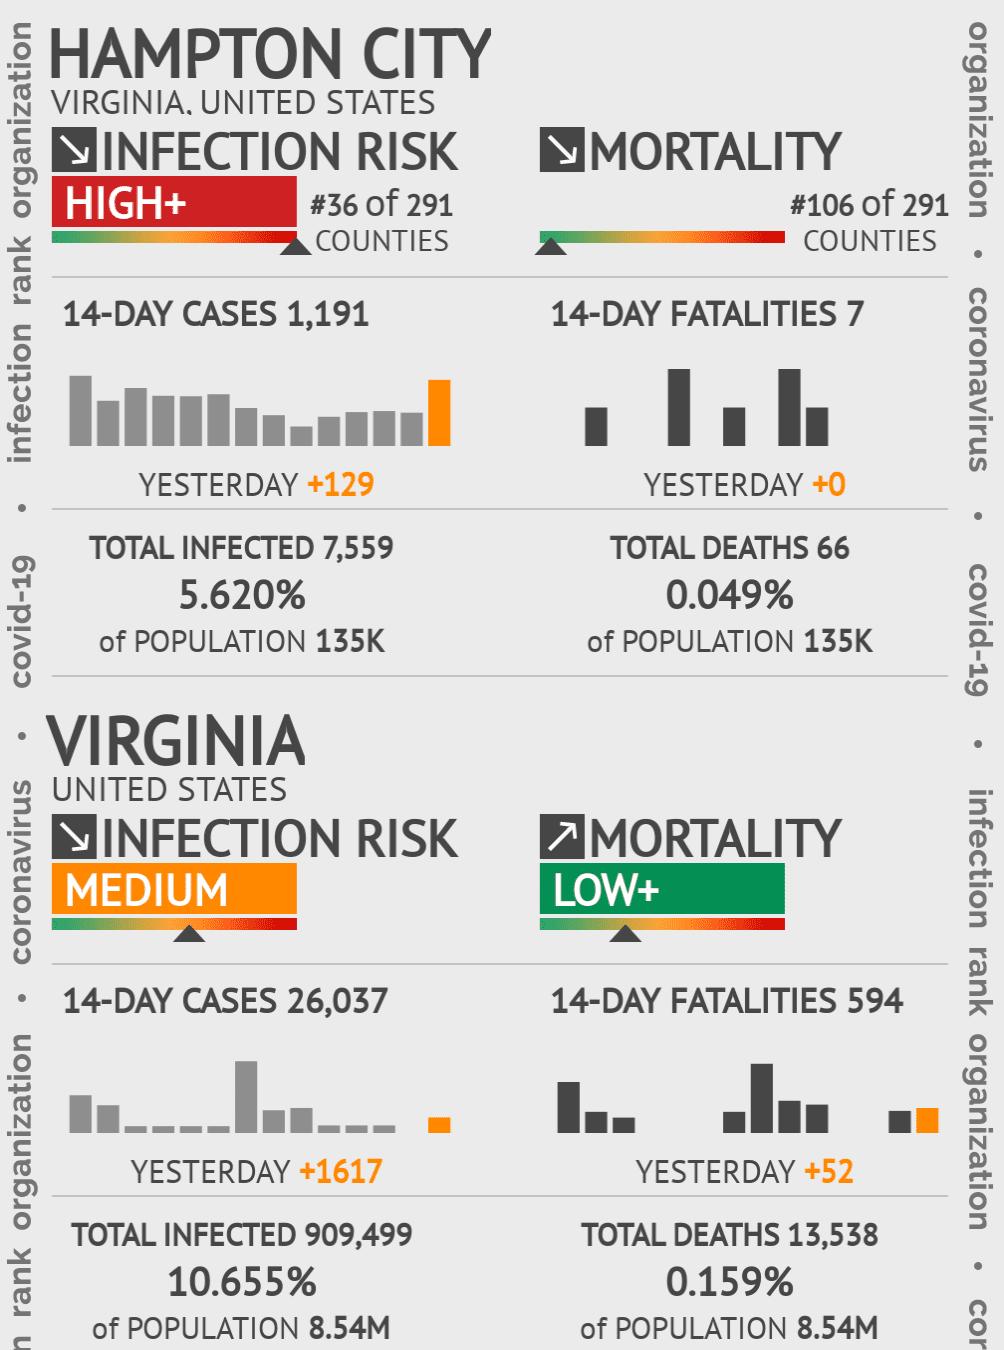 Hampton City Coronavirus Covid-19 Risk of Infection on February 04, 2021